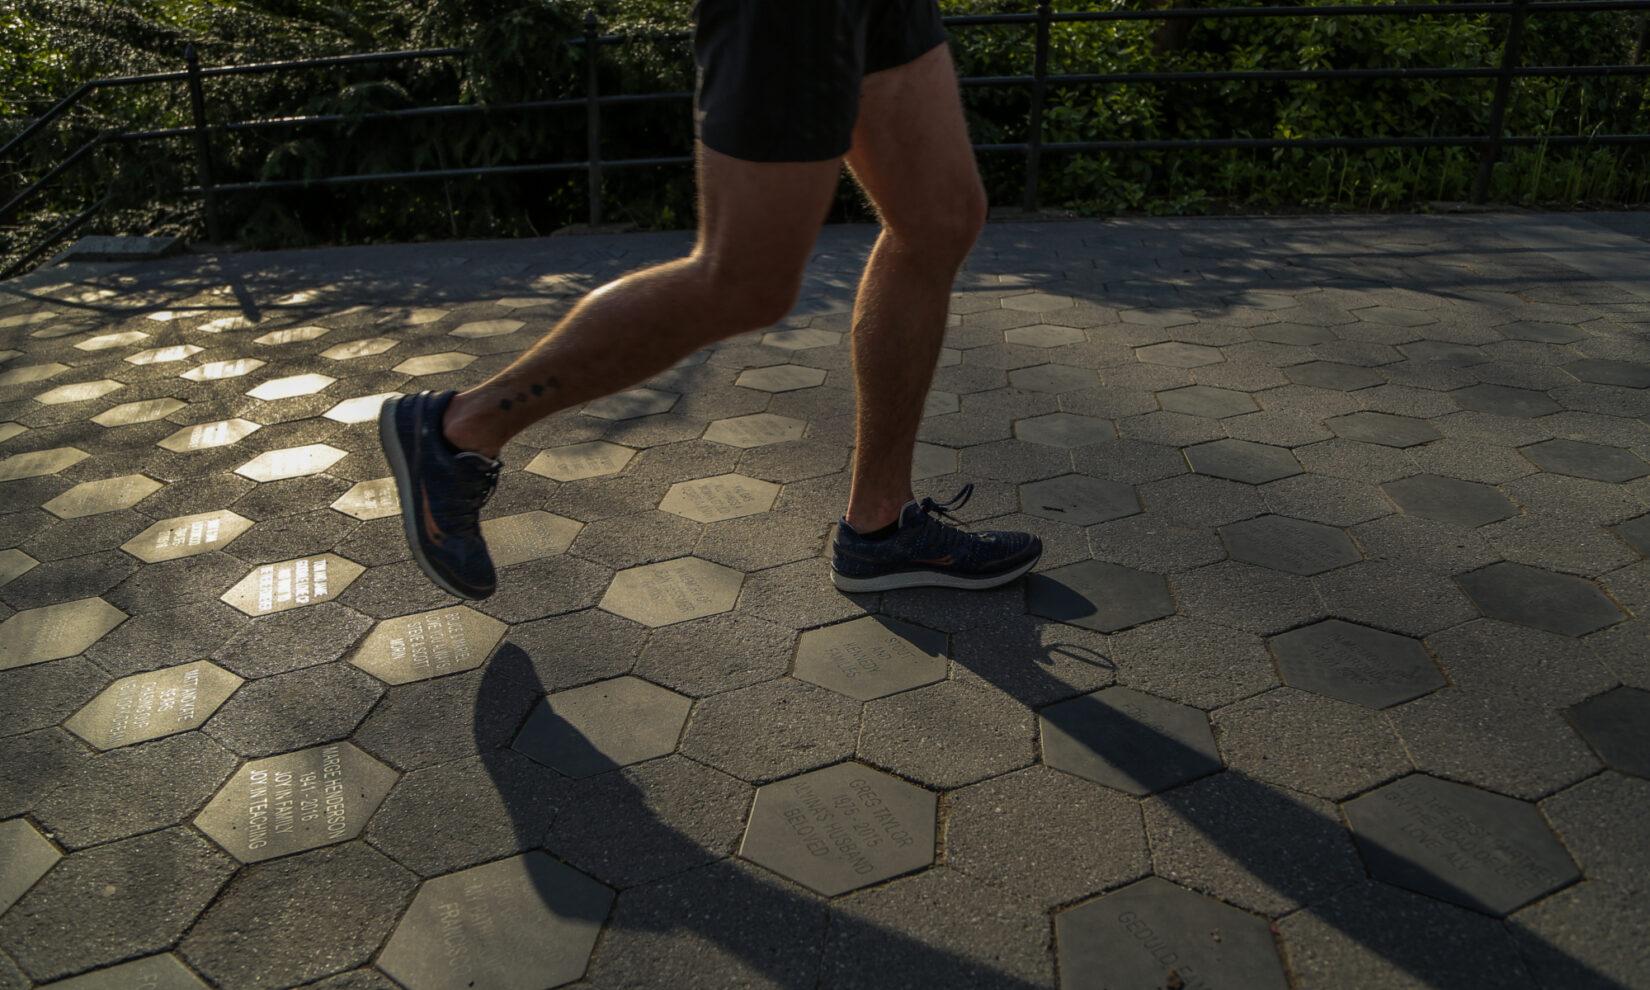 A runner jogs over the memorial stones of Gilder Run, shot in twilight